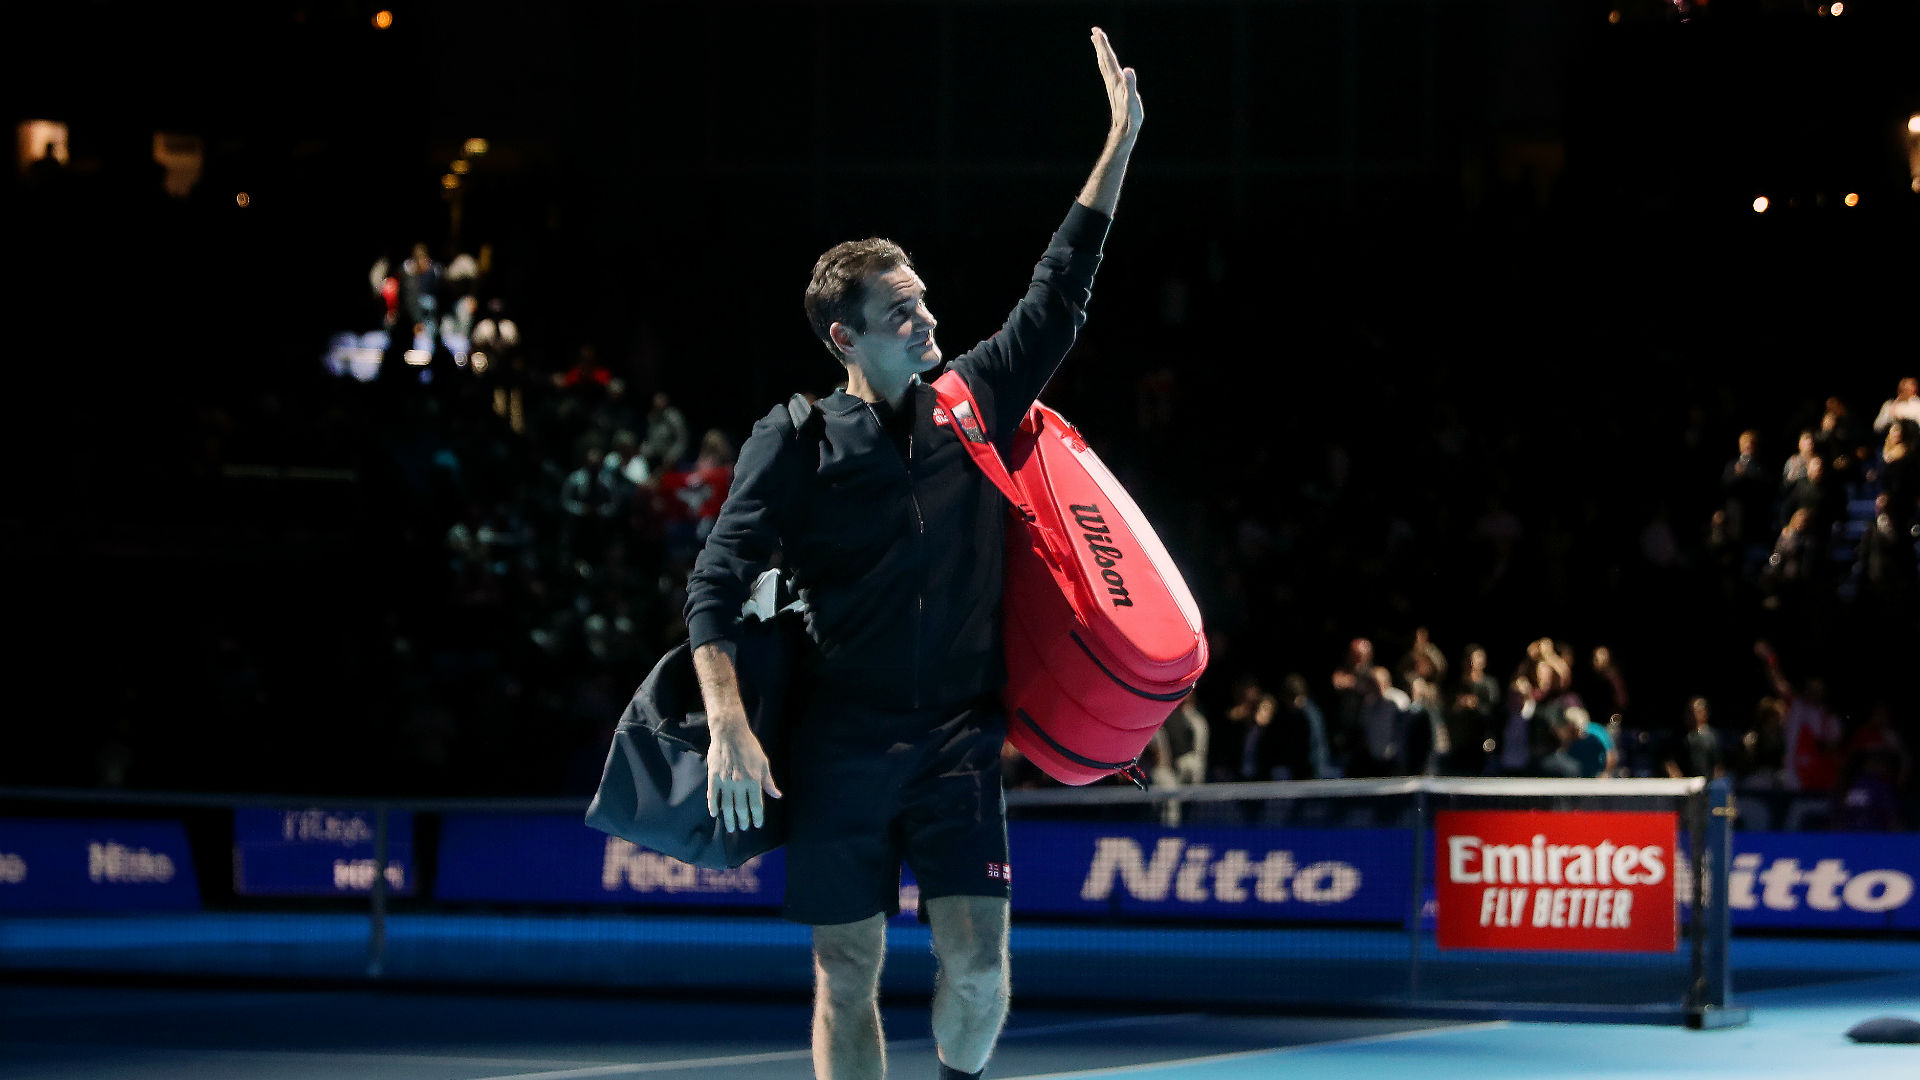 Roger Federer revels in 'magical' victory over Novak Djokovic after Wimbledon heartbreak - Sporting News AU